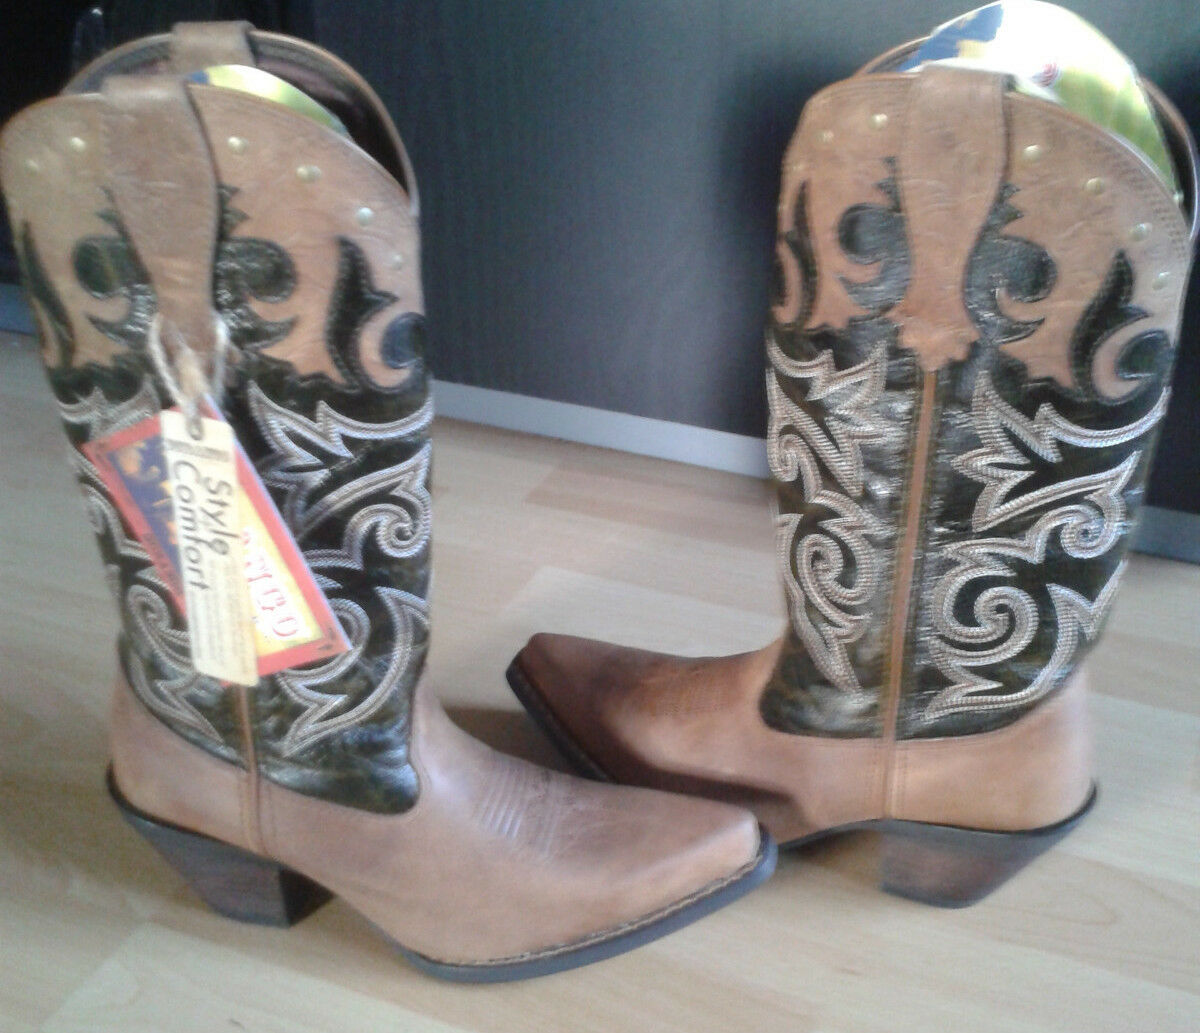 Cowboystiefel, Westernstiefel Westernstiefel Westernstiefel US Gr. 6,5 Stiefel Damen Stiefel braun TOP    33fb29